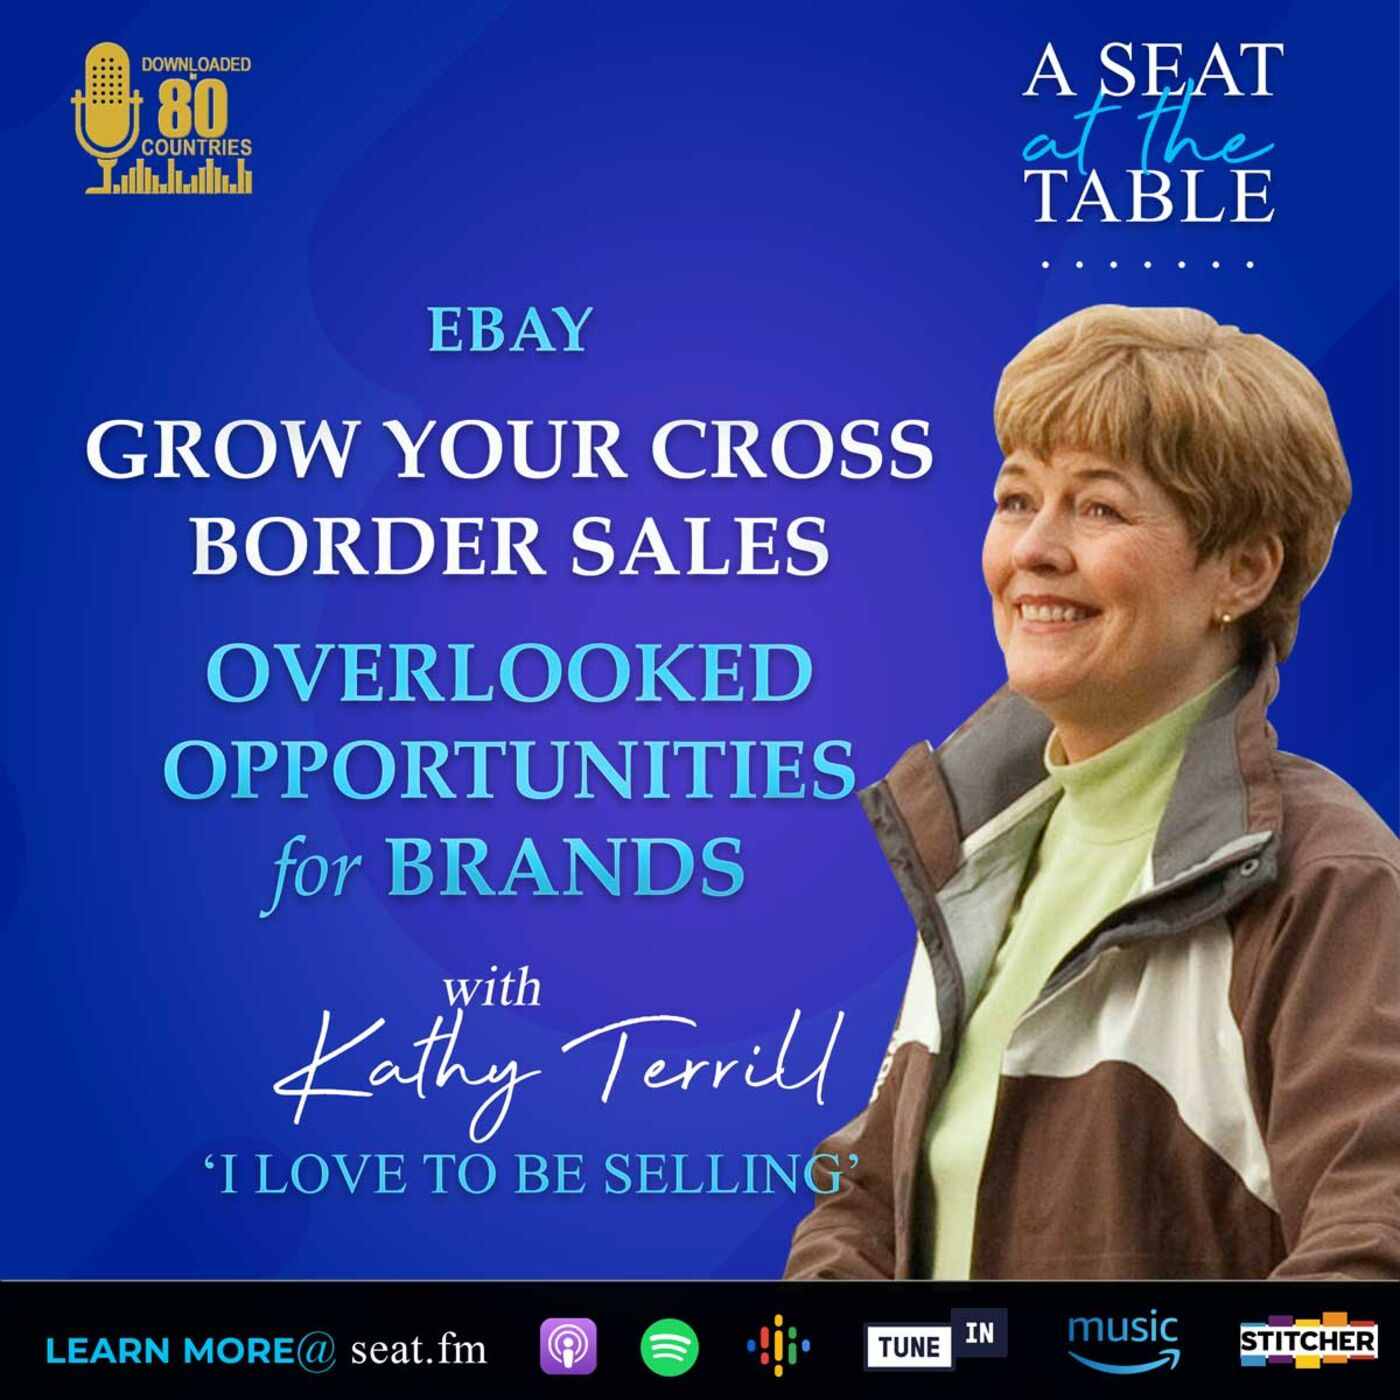 Grow Your Cross Border Sales:  Overlooked Opportunities on eBay for Brands